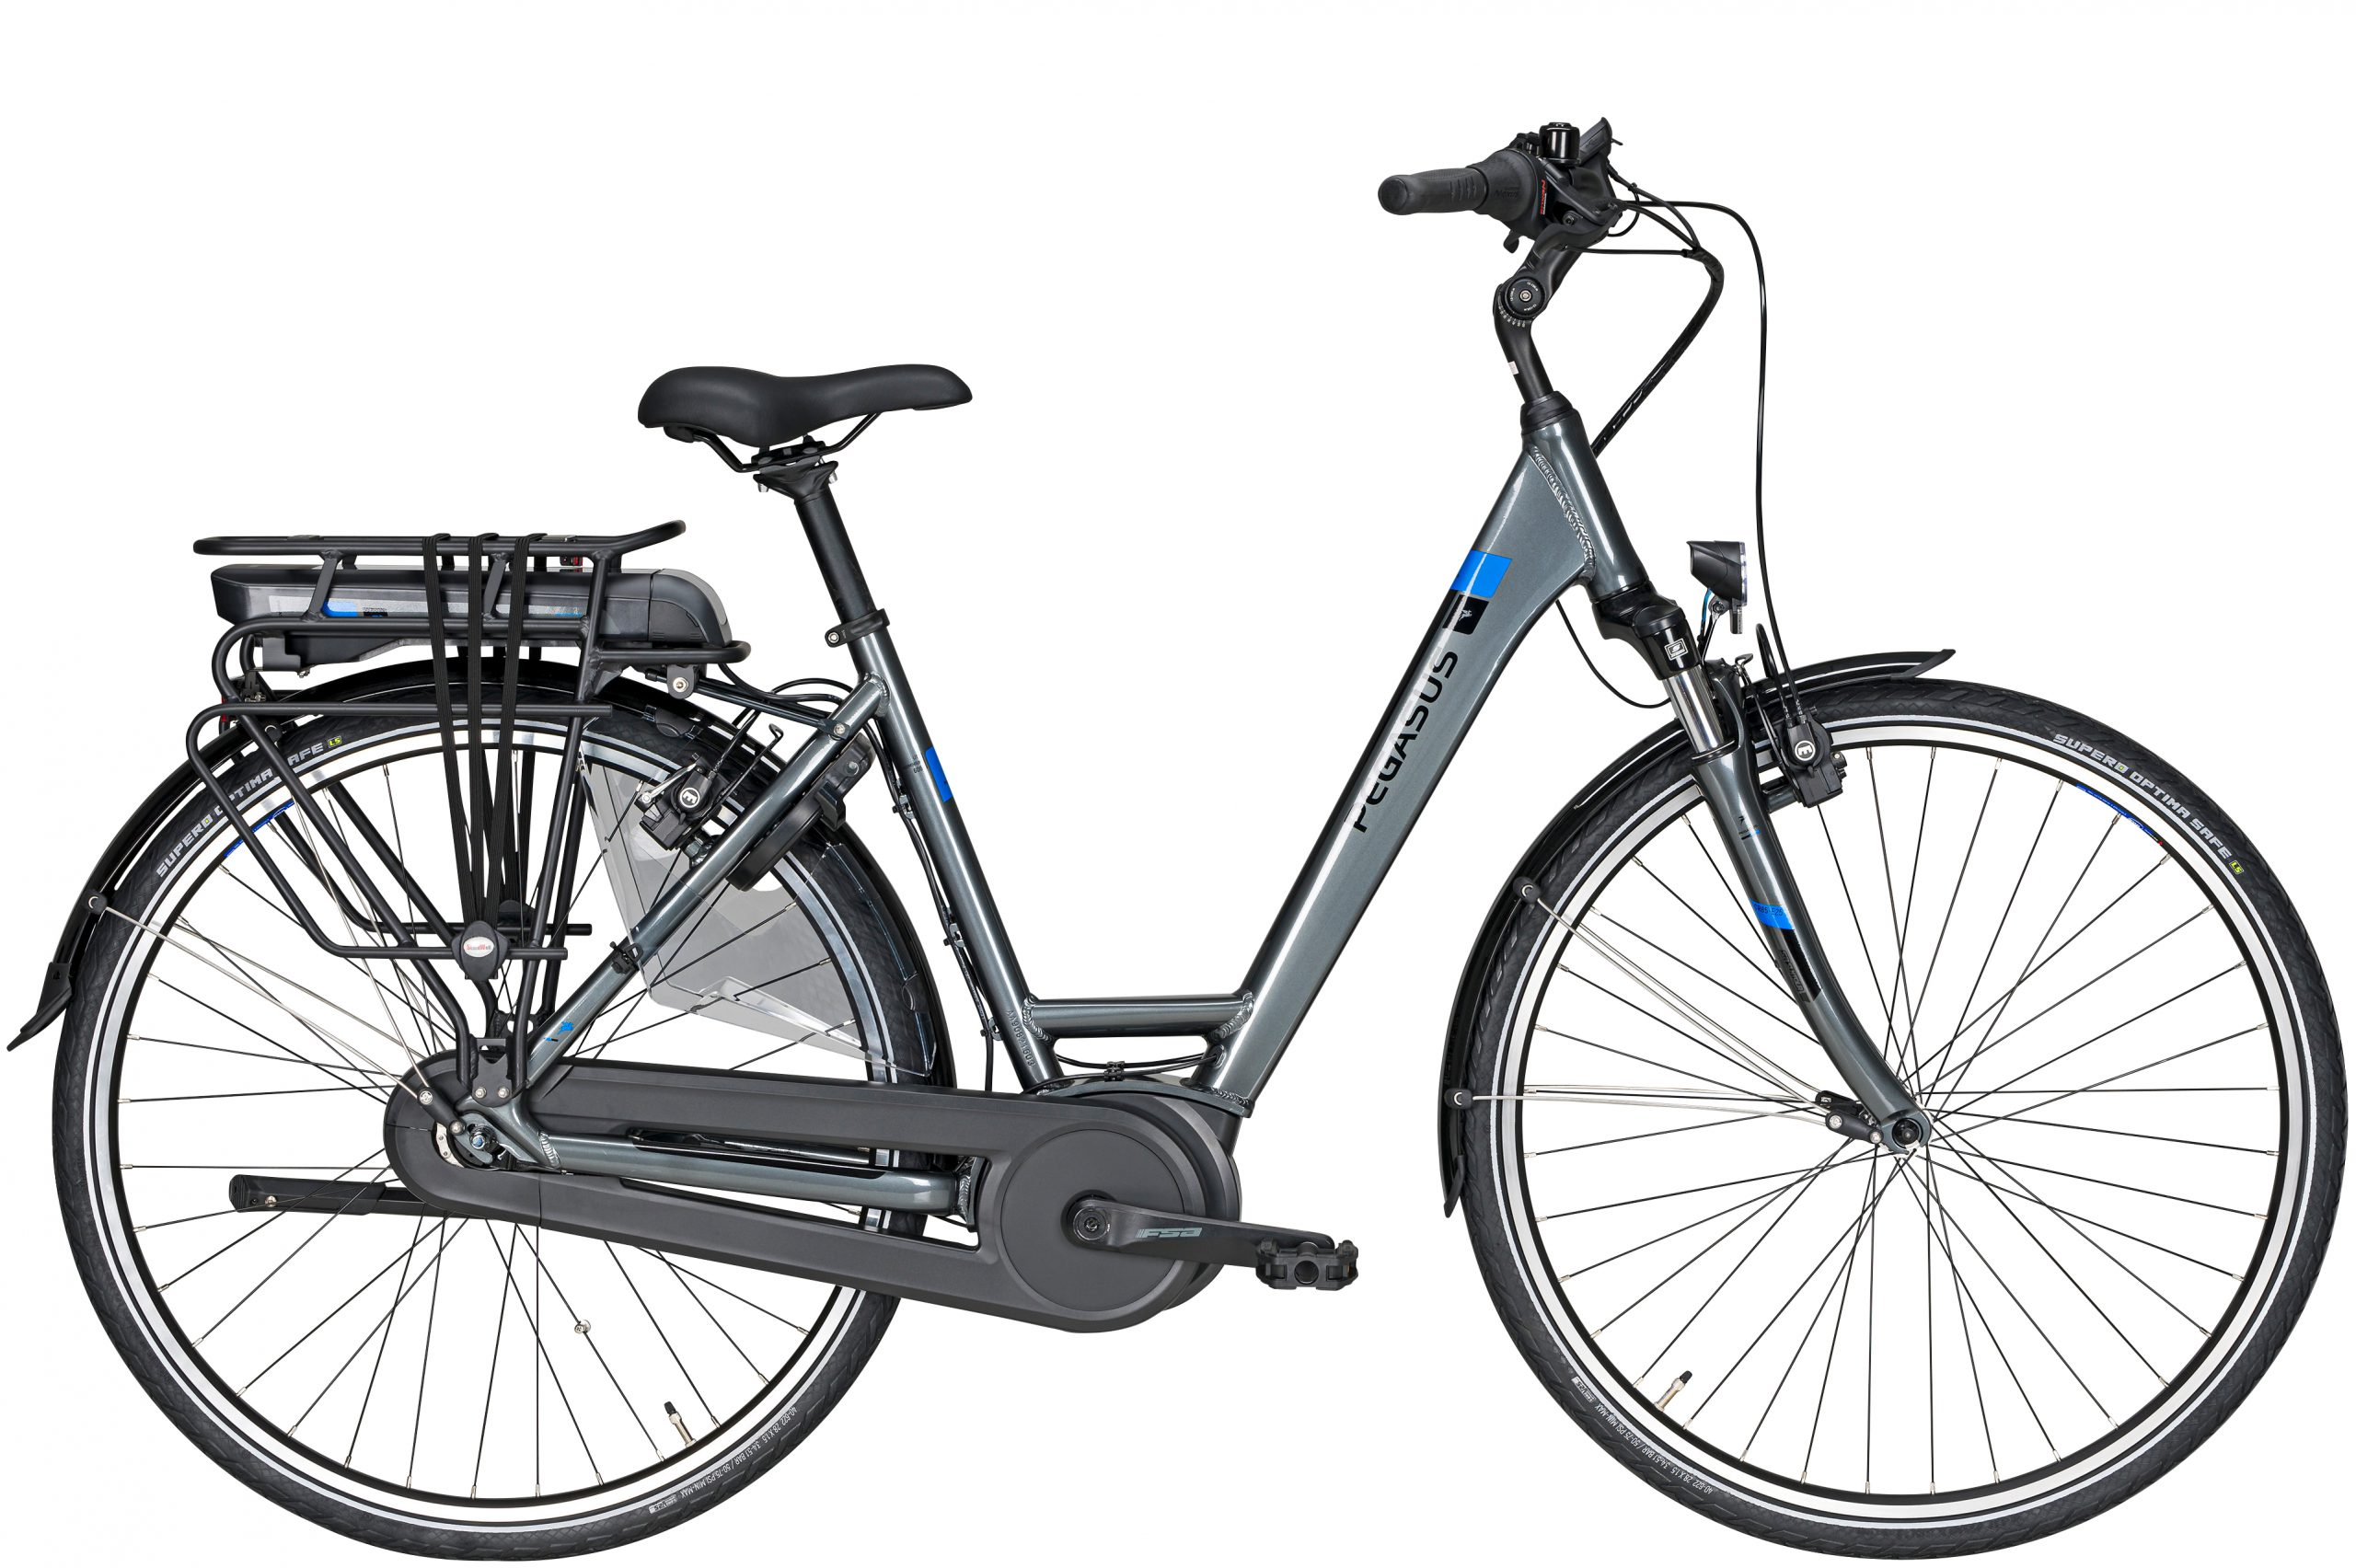 Pegasus Piazza e-bike kopen